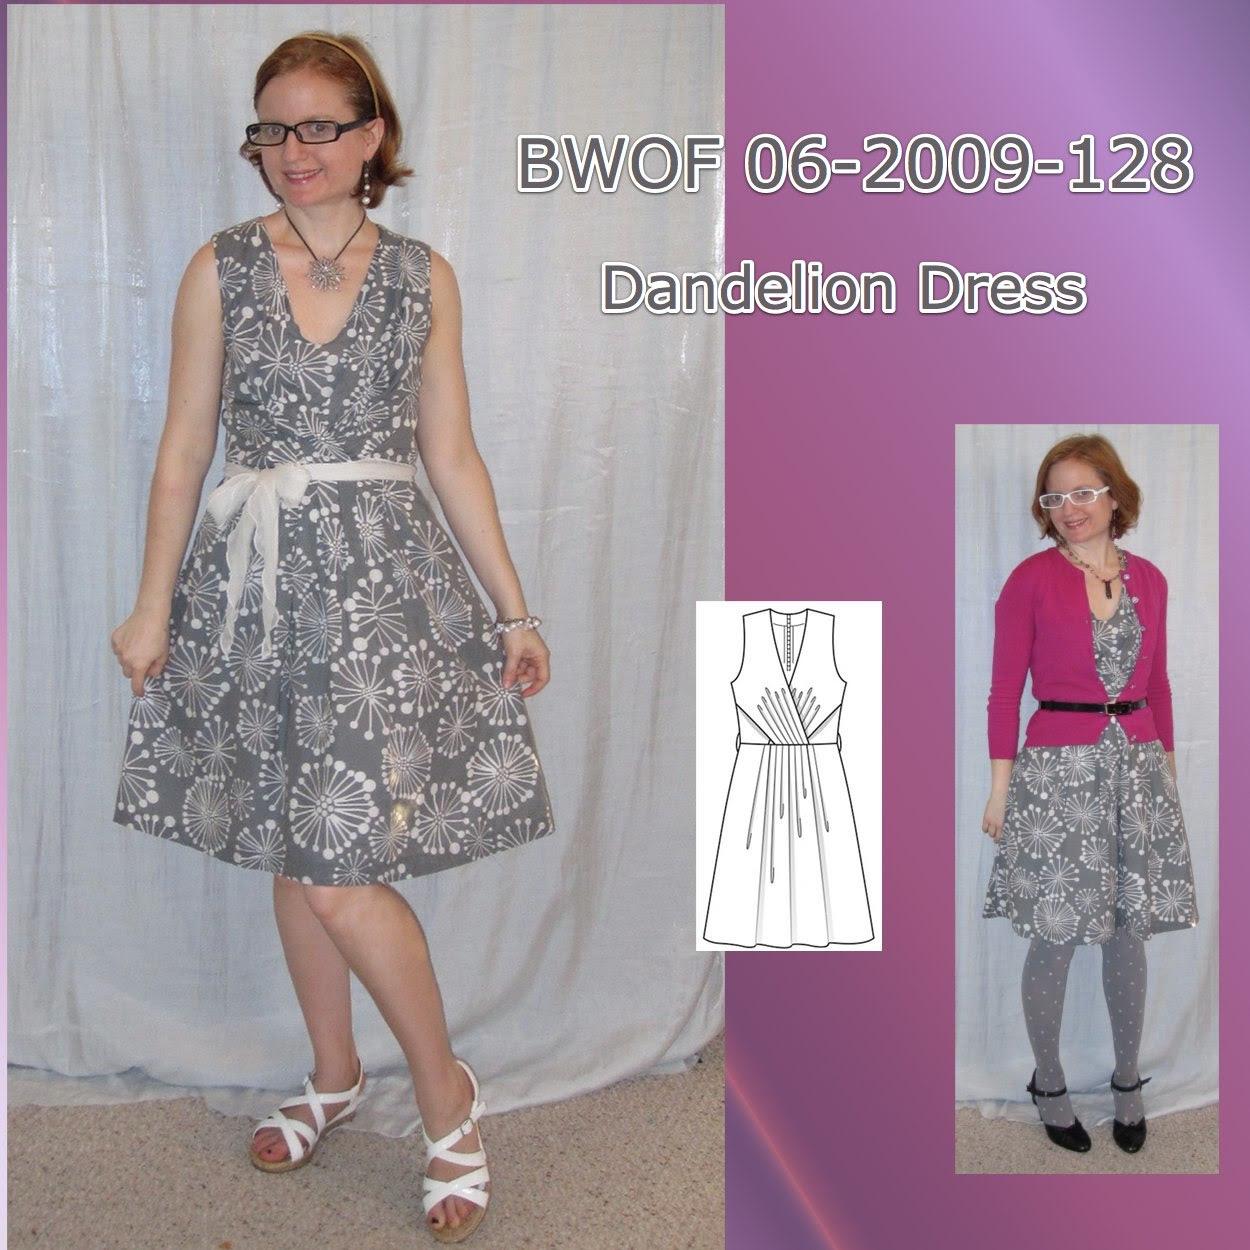 BWOF 06-2009-128 Thumbnail